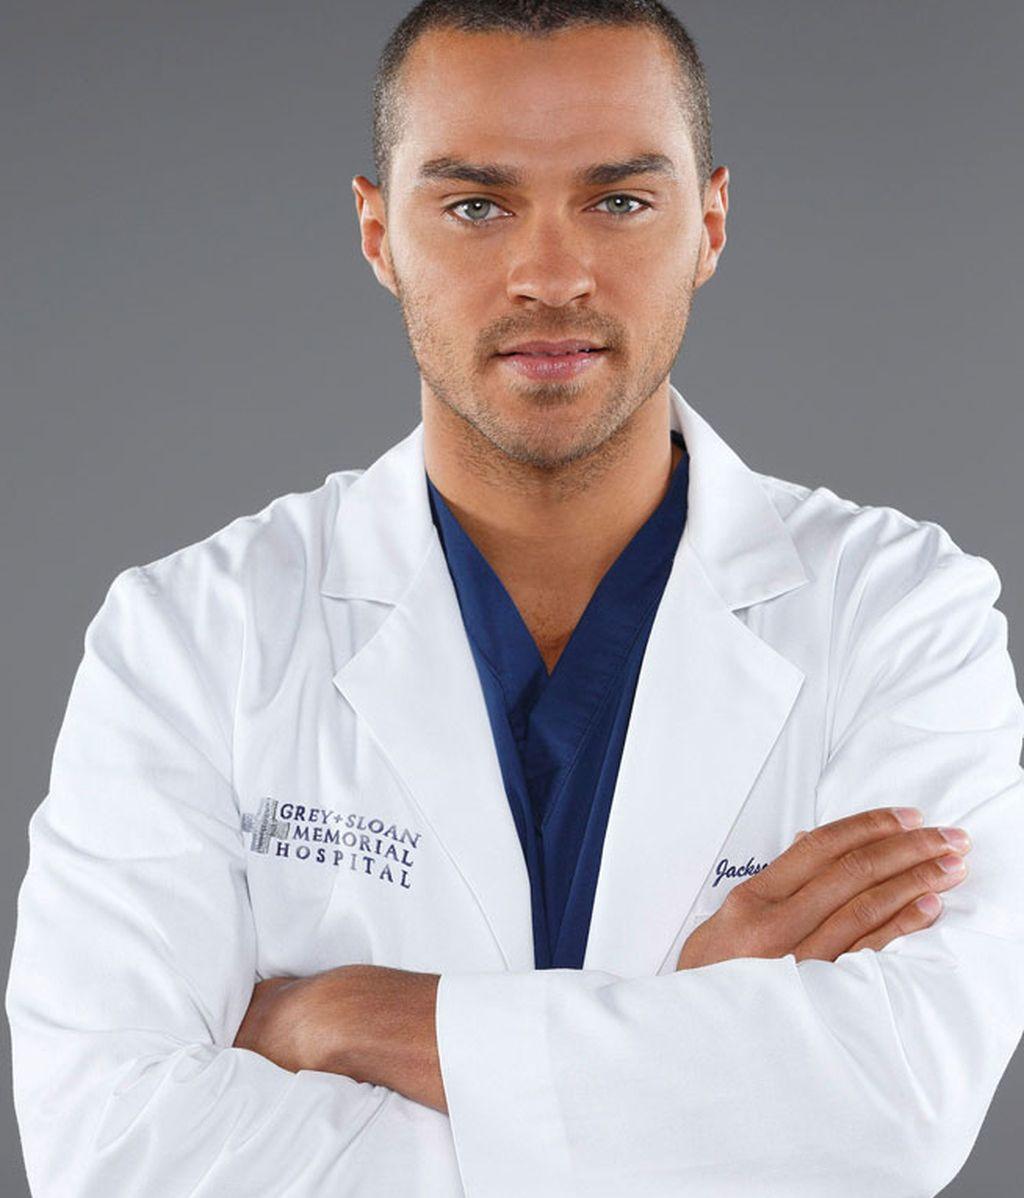 Jesse Williams interpreta al cirujano plástico Jackson Avery